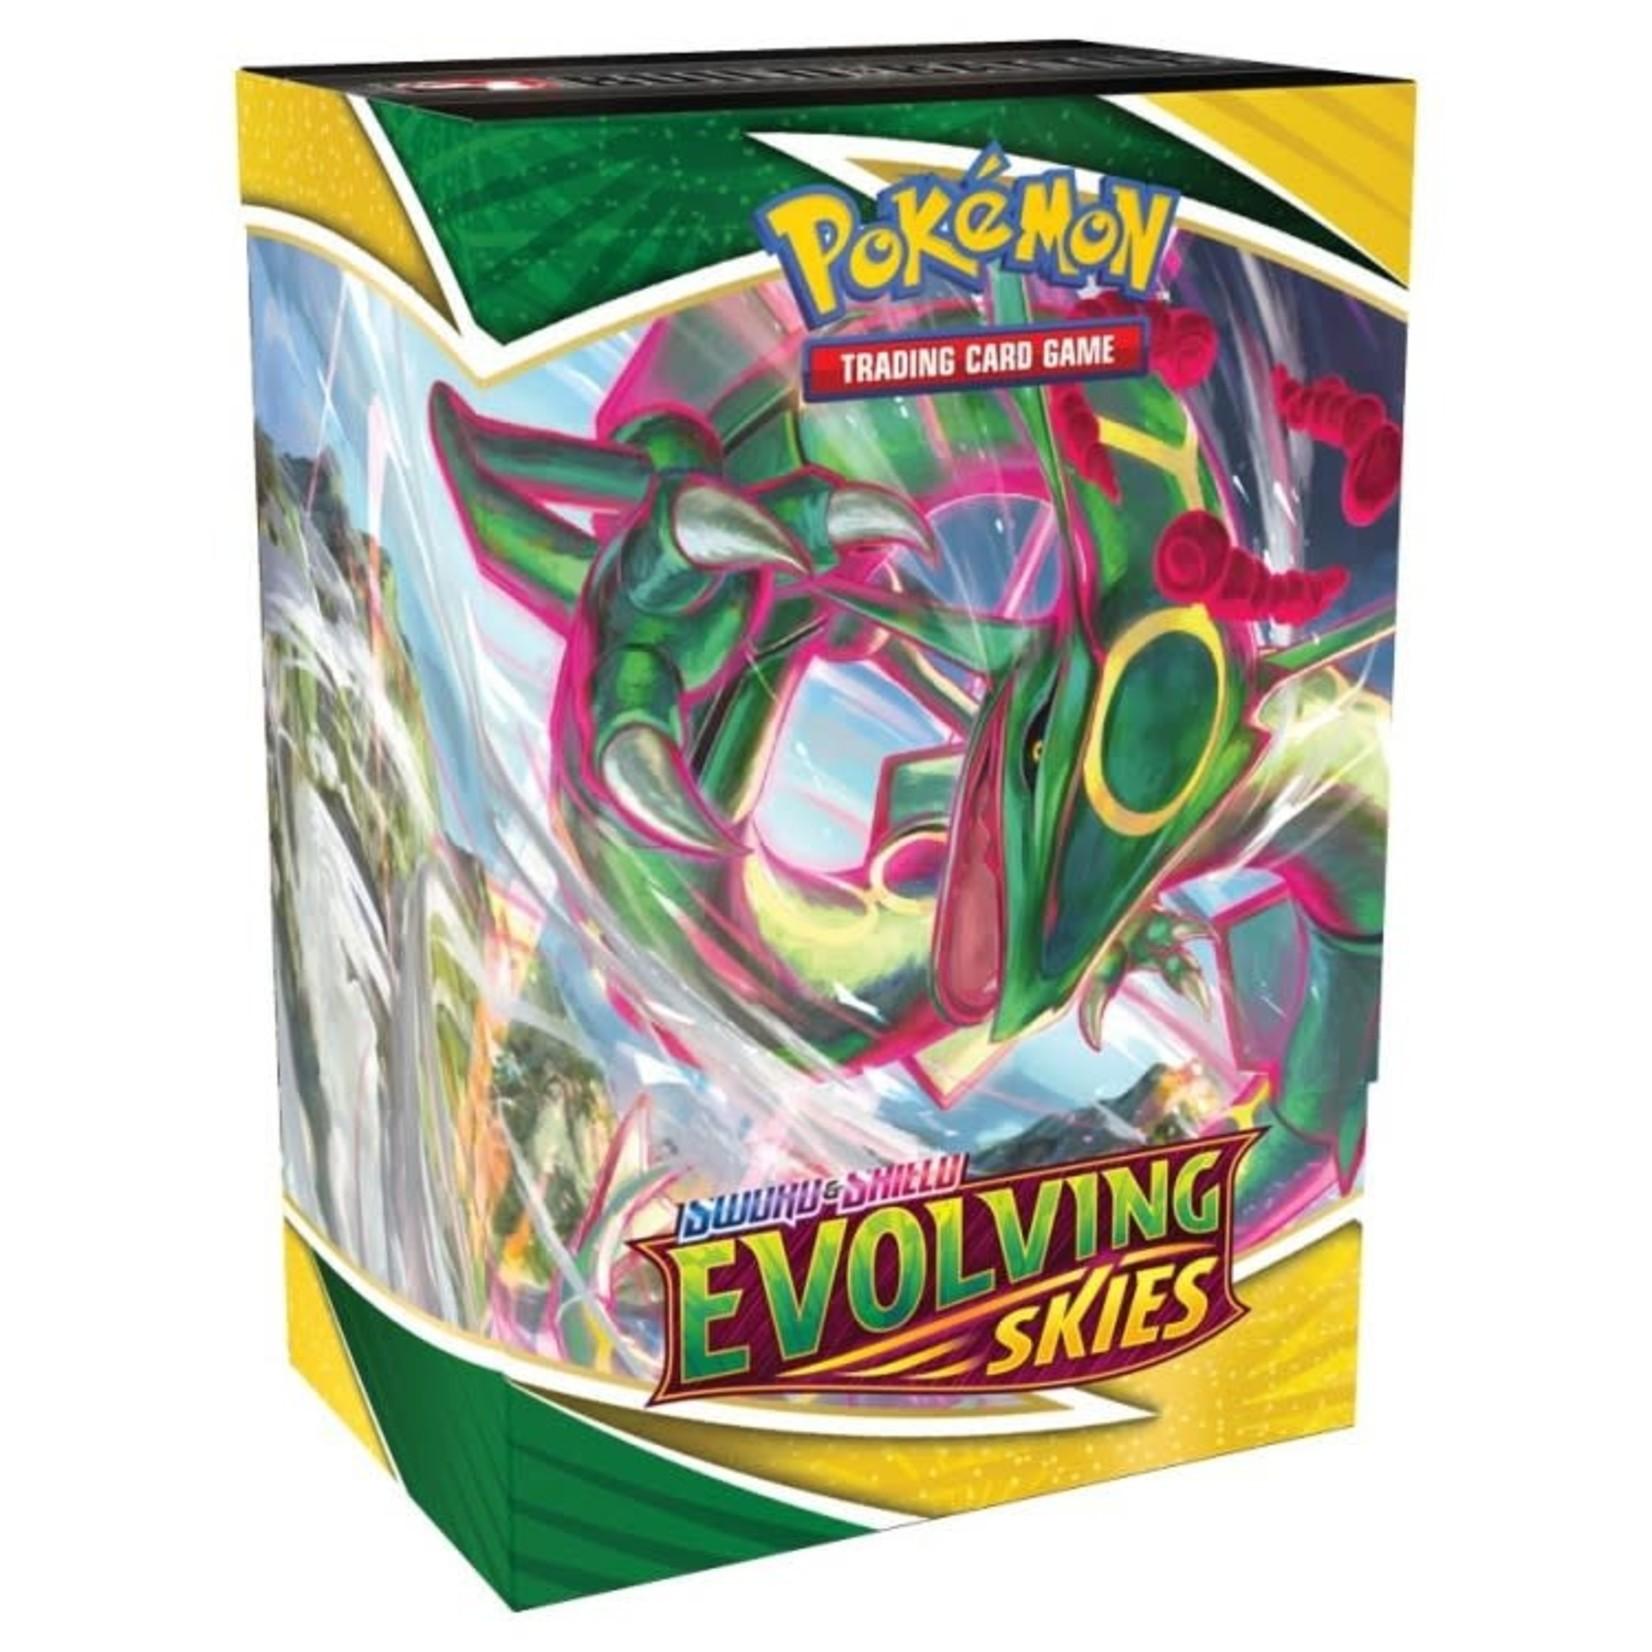 Pokemon International Pokemon Trading Card Game: Sword and Shield Evolving Skies Build & Battle Box